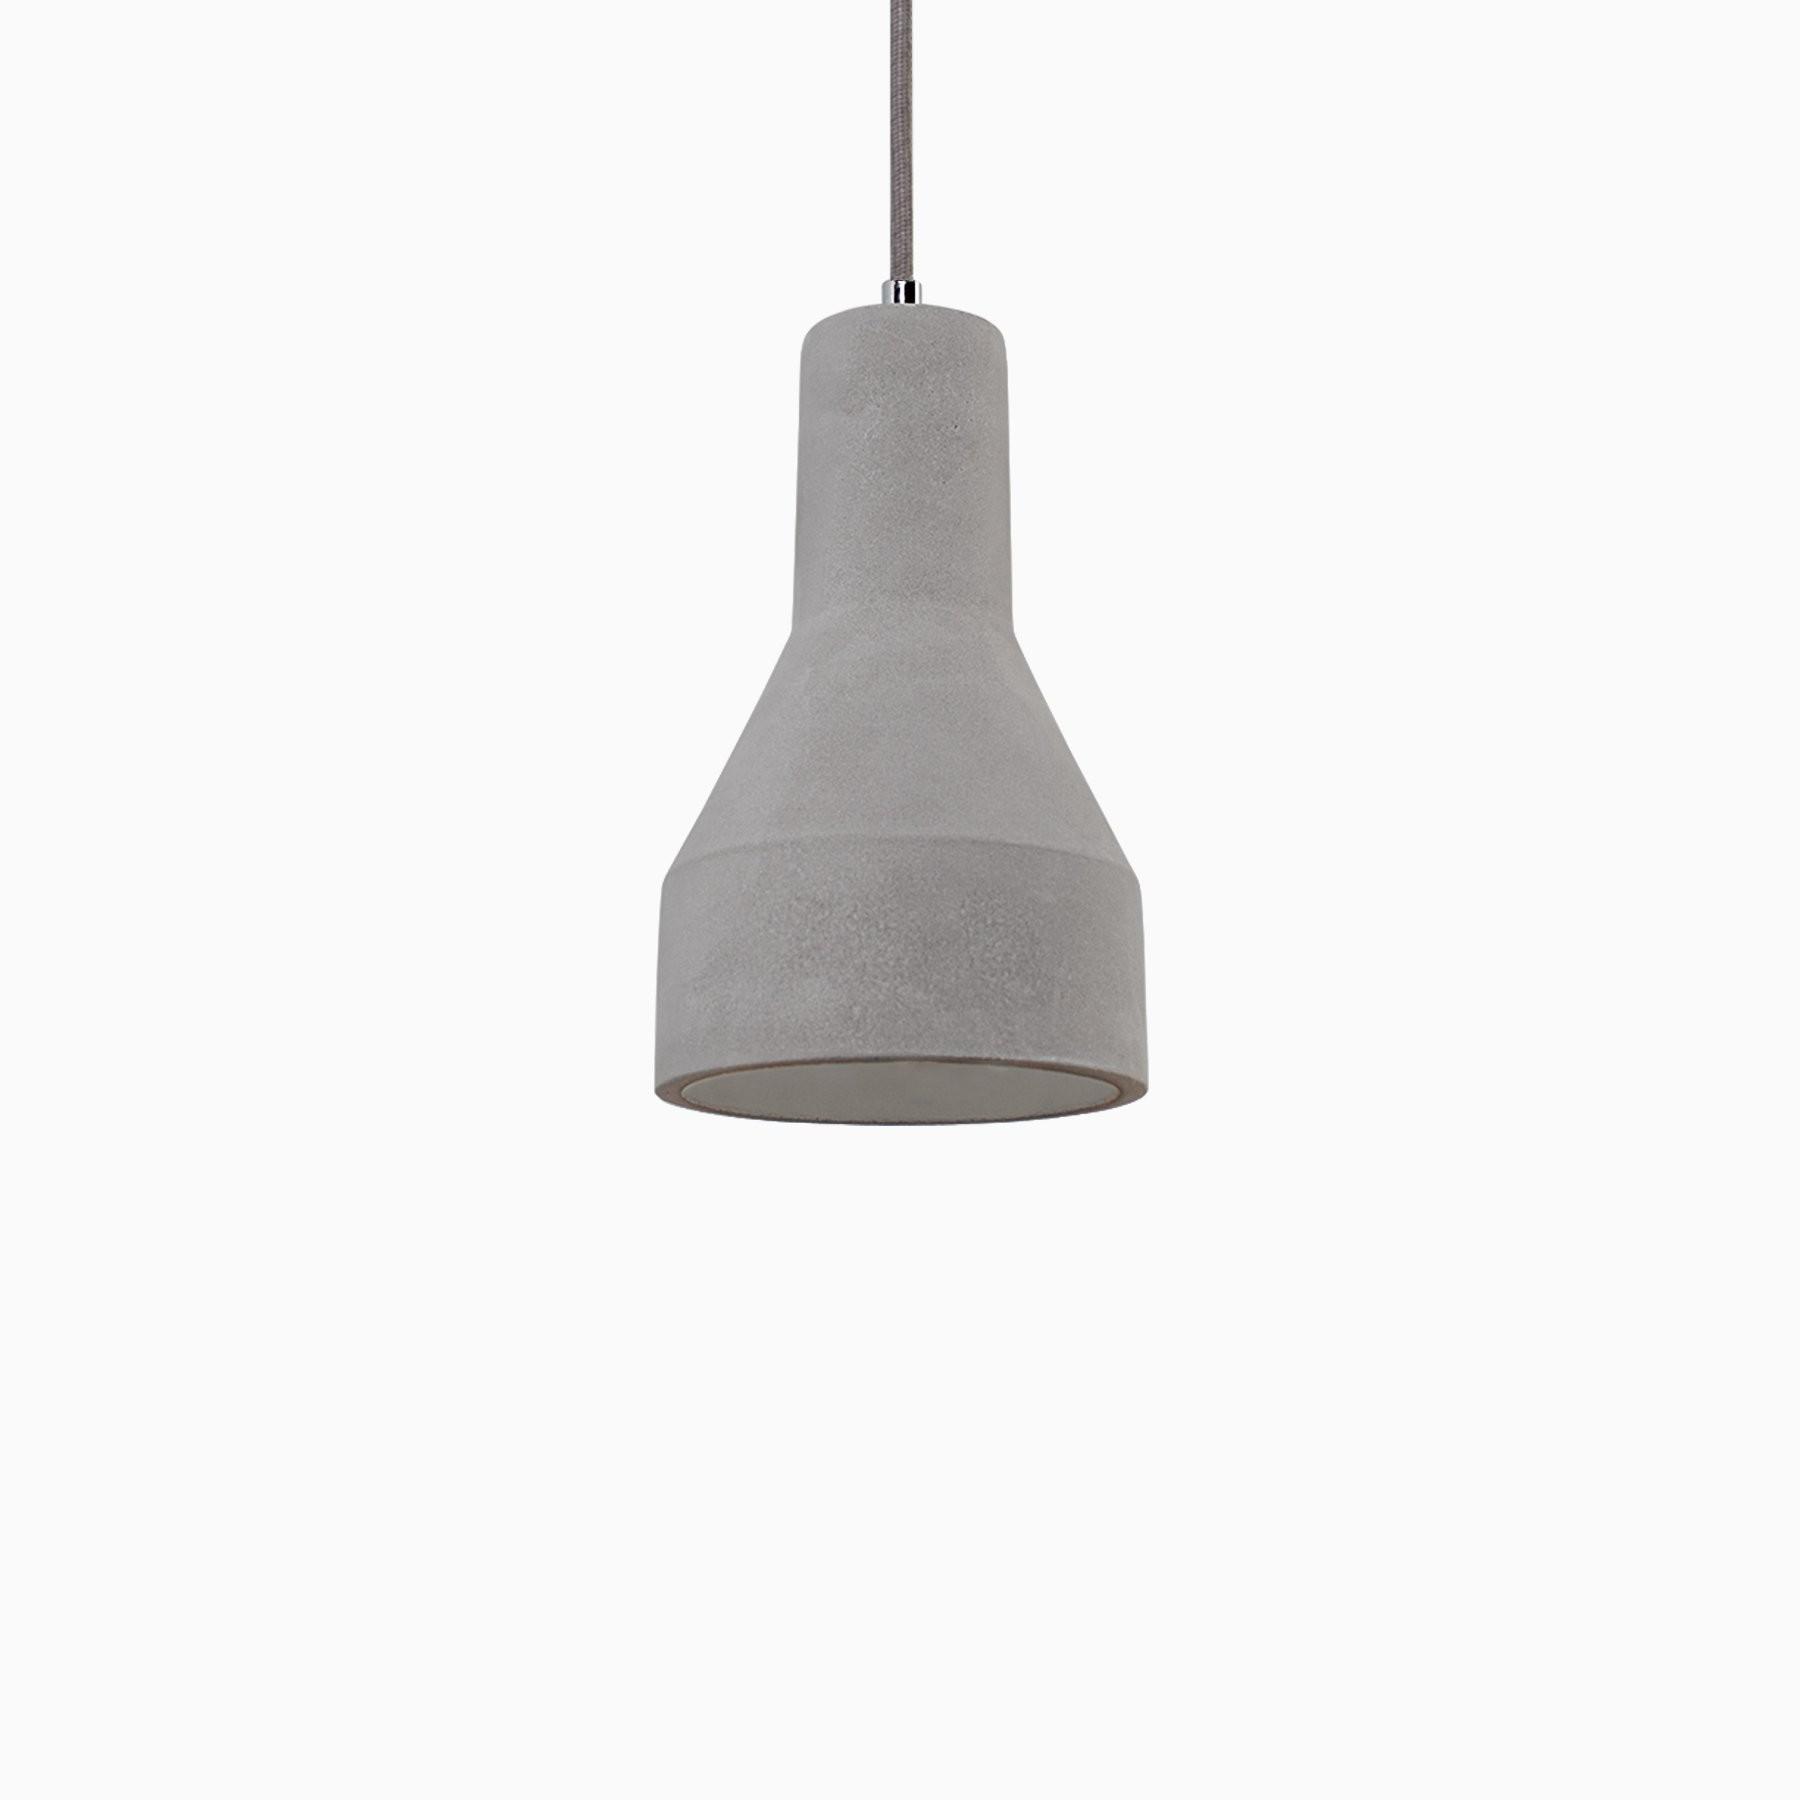 Superbe Amelia Concrete Pendant Light With Gray Cord